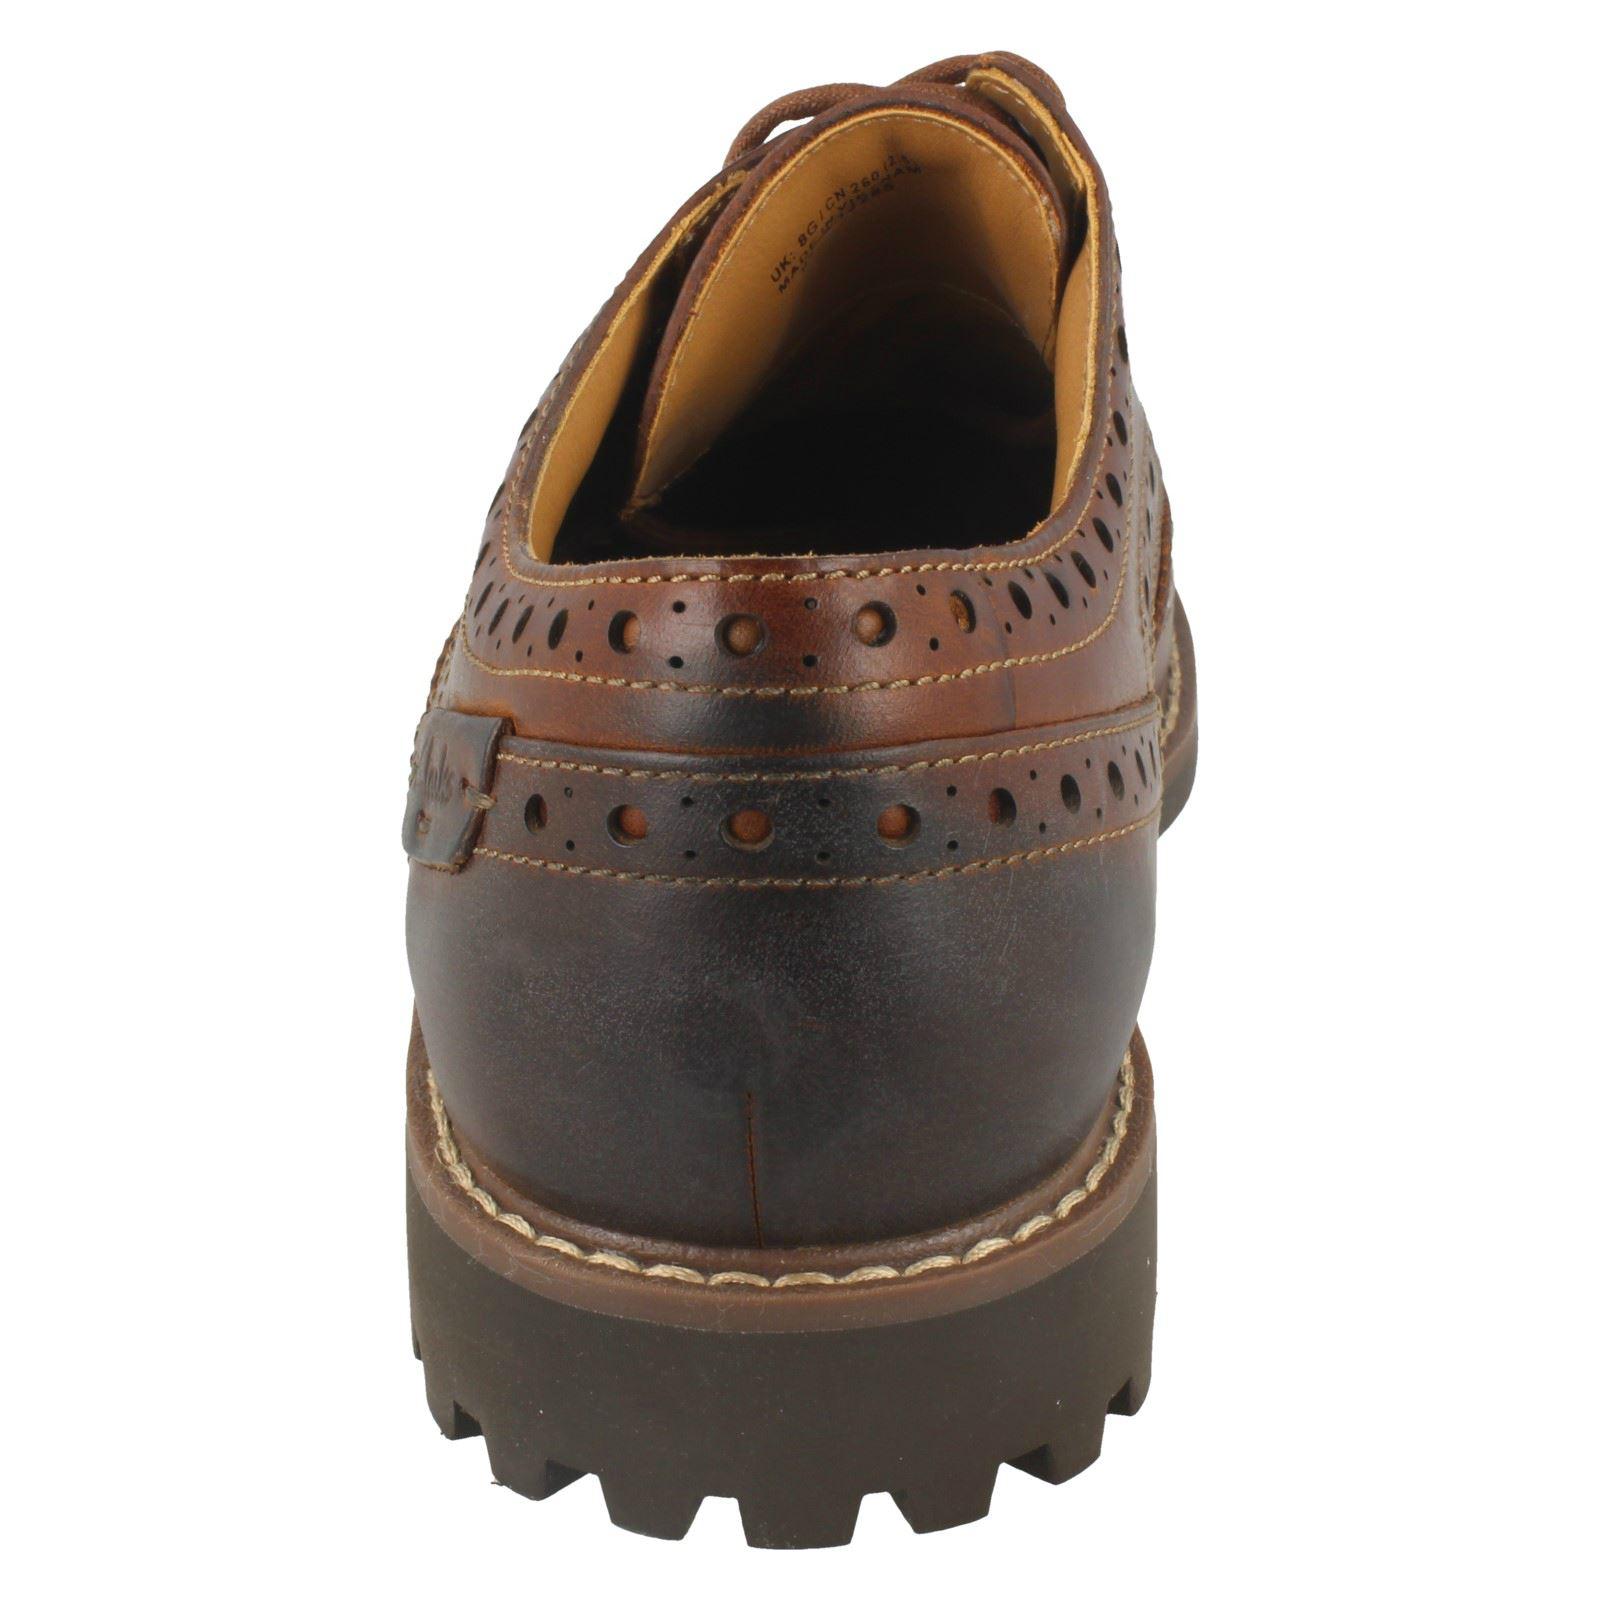 ' Schuhes Uomo Clarks' Formal Brogue Schuhes ' - Montacute Wing 6e943e